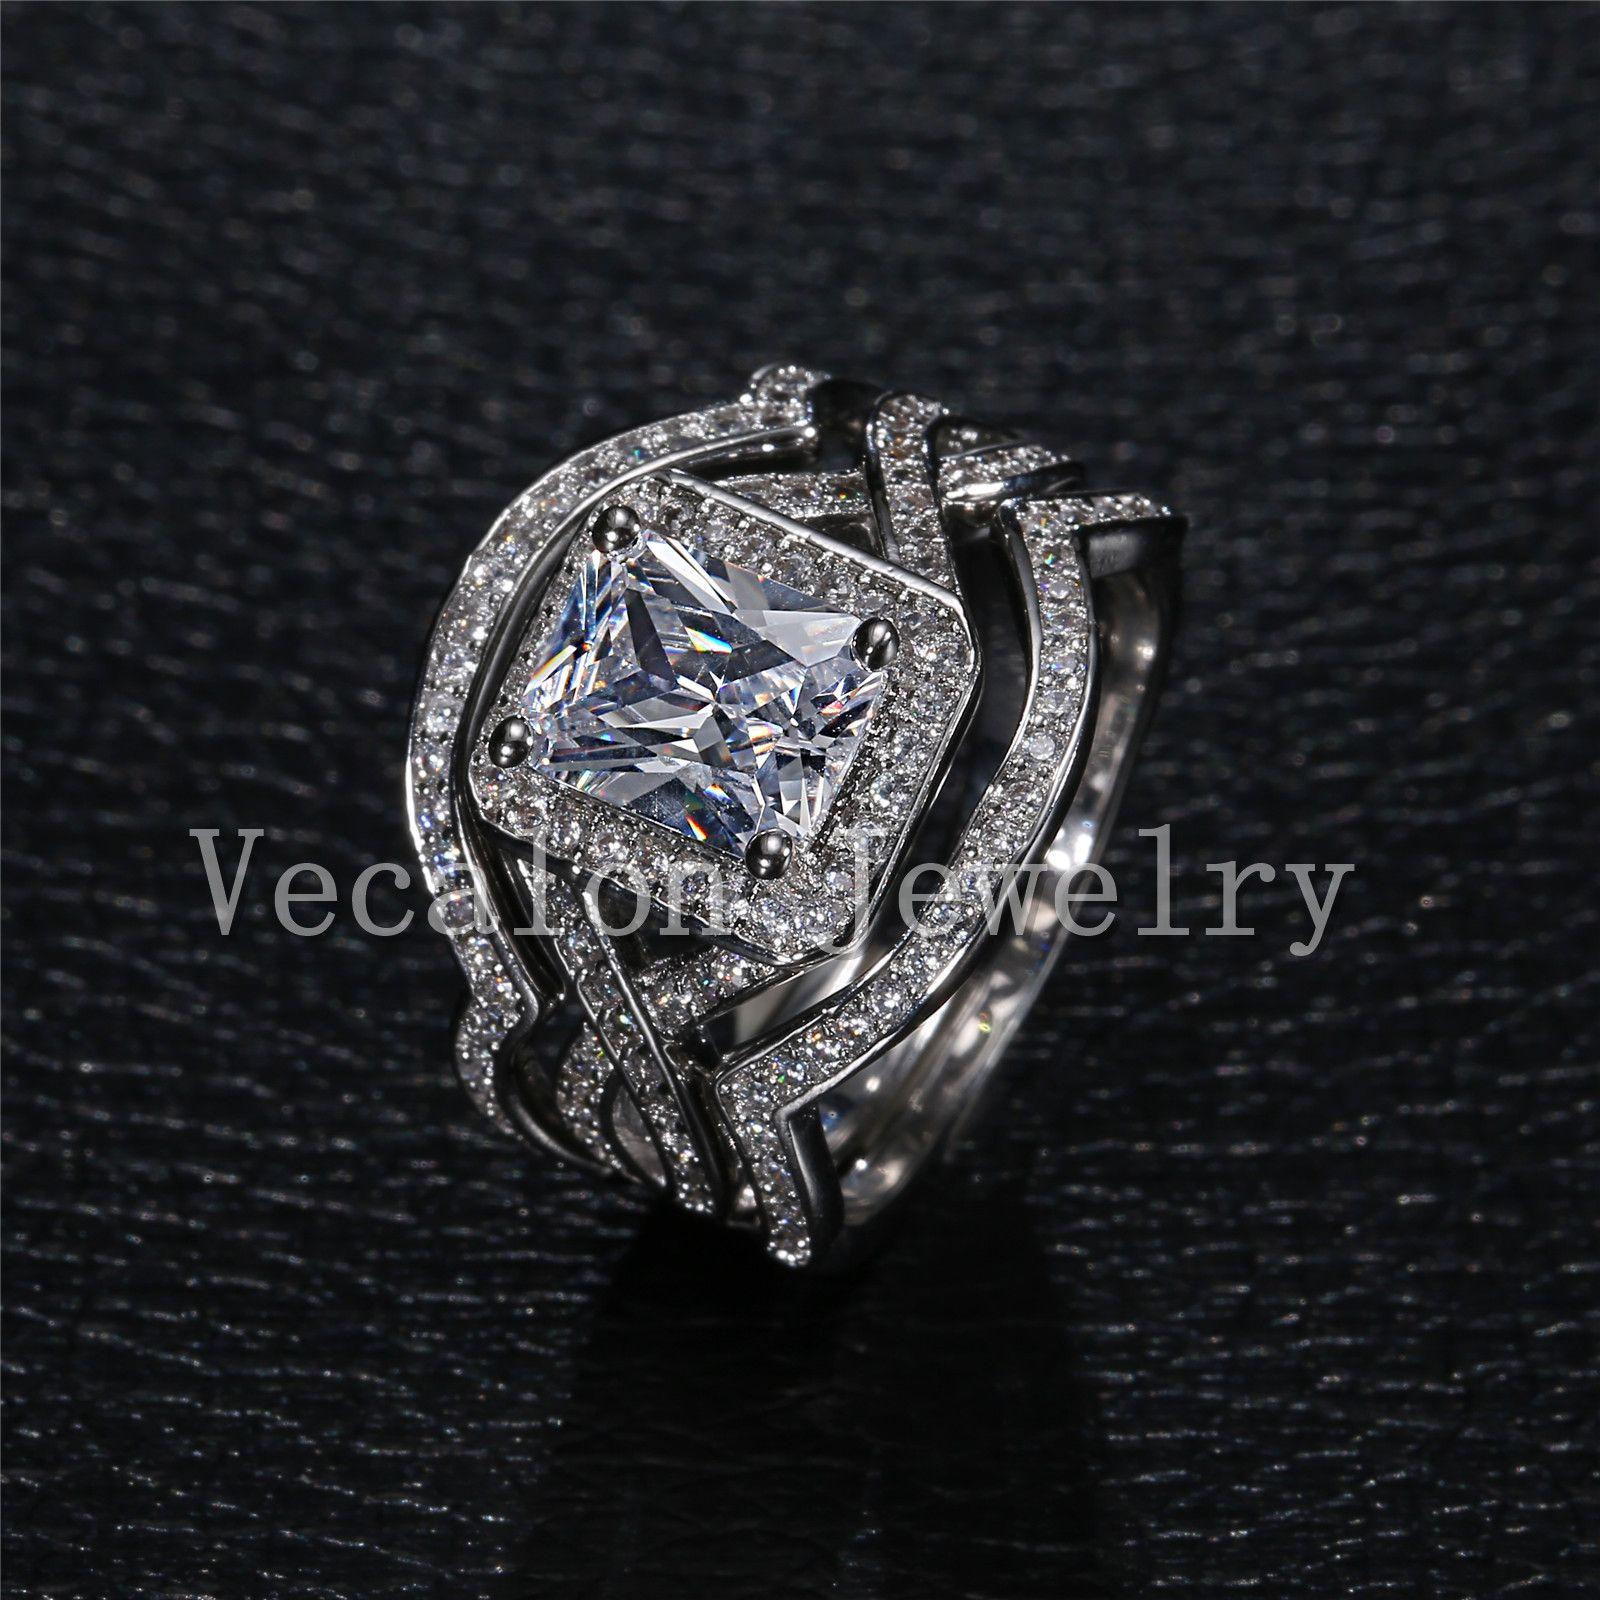 Vecalon Princess cut 4ct Simulated diamond cz 3-in-1 약혼 웨딩 밴드 반지 세트 여성용 10KT 화이트 골드 채워진 반지